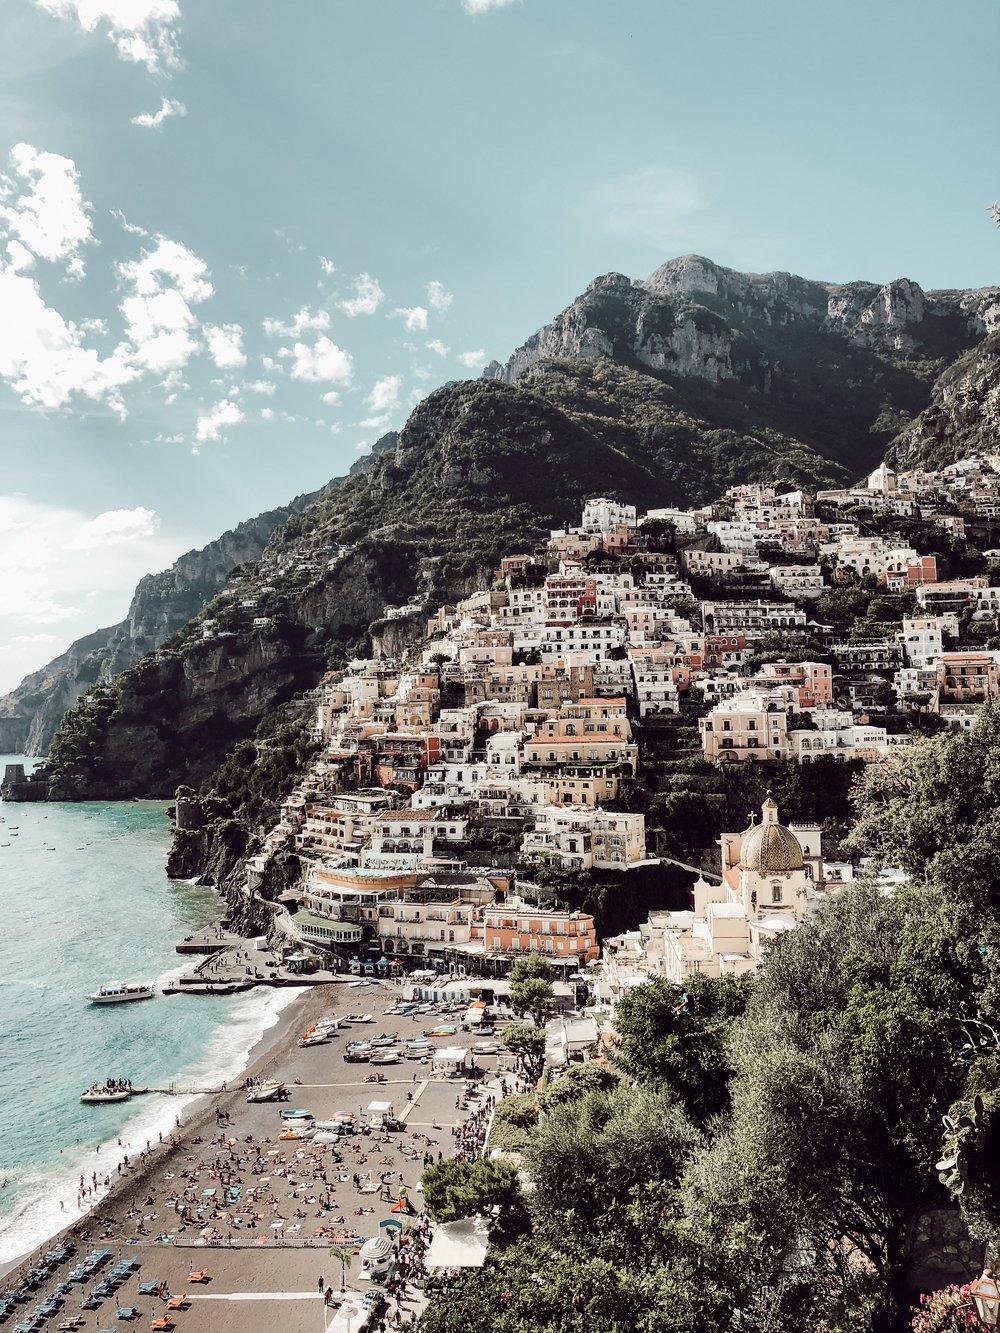 Positano Beach | Three Days on the Amalfi Coast, Amalfi Travel Guide, What to Do in Amalfi Italy | Miranda Schroeder Blog